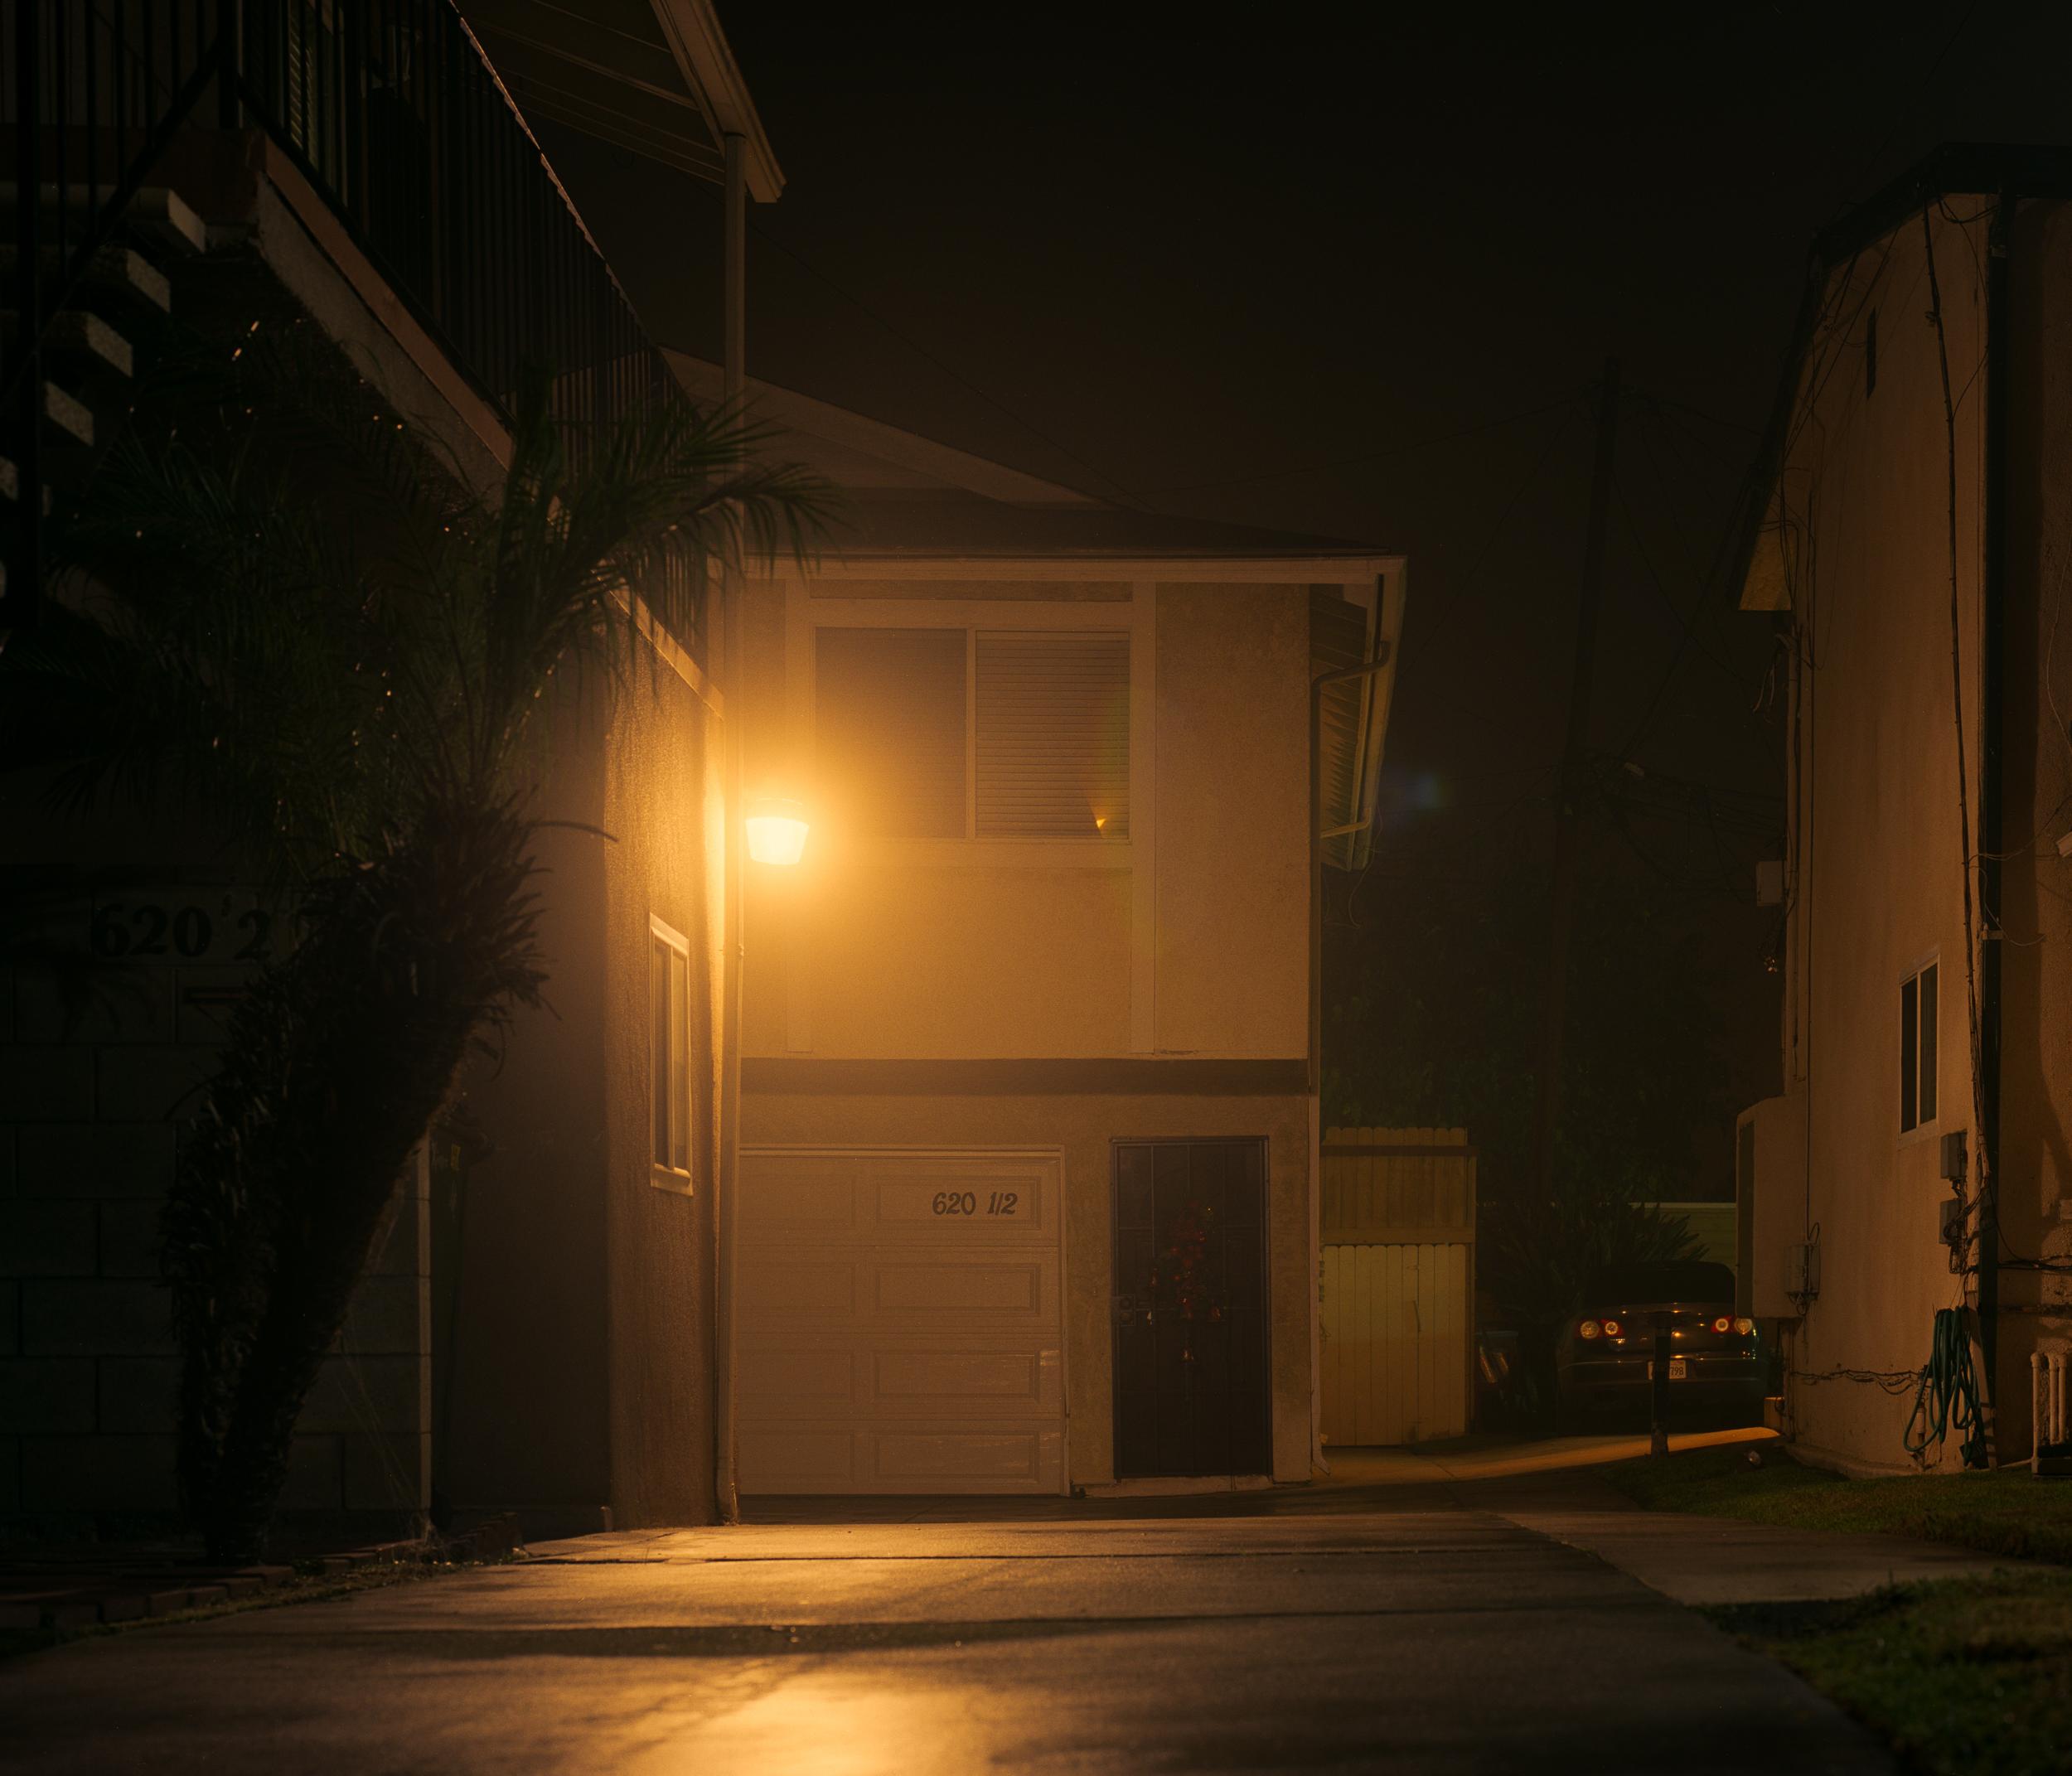 NIGHT_ADDS-150105-1.jpg